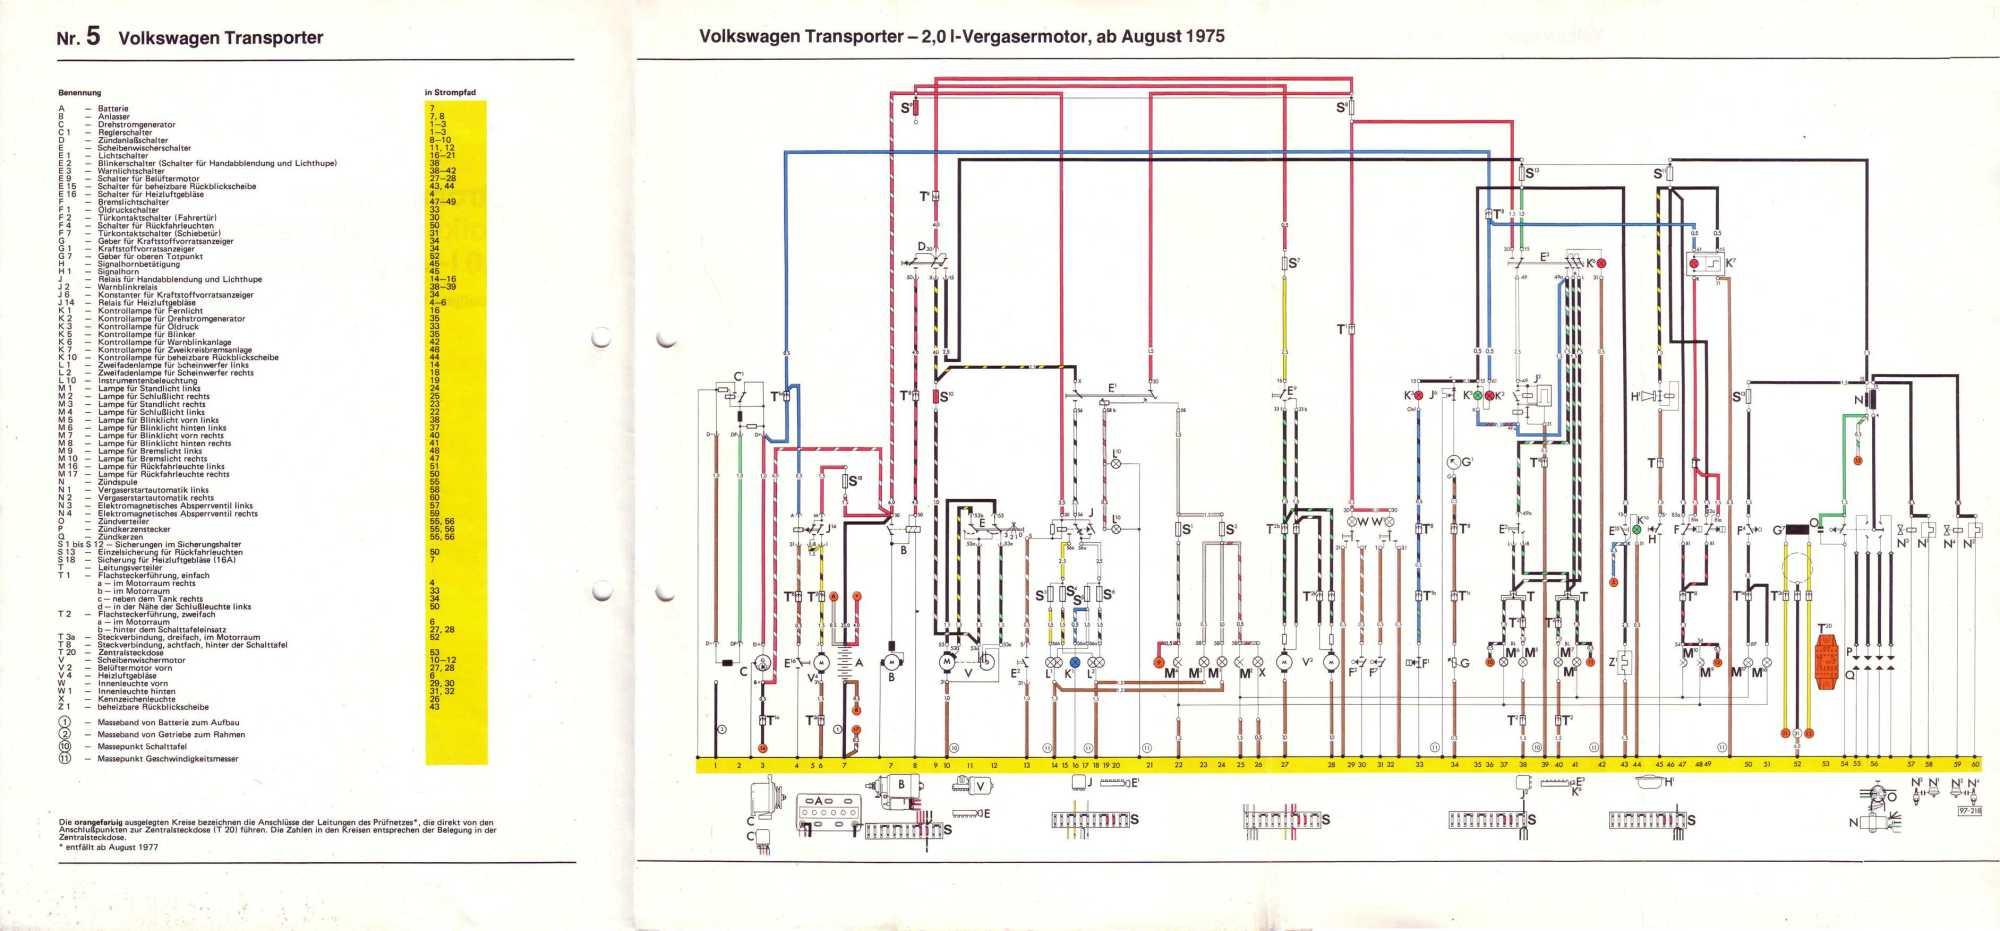 hight resolution of  volkswagen transporter 2 0 l vergasermotor ab august 1975